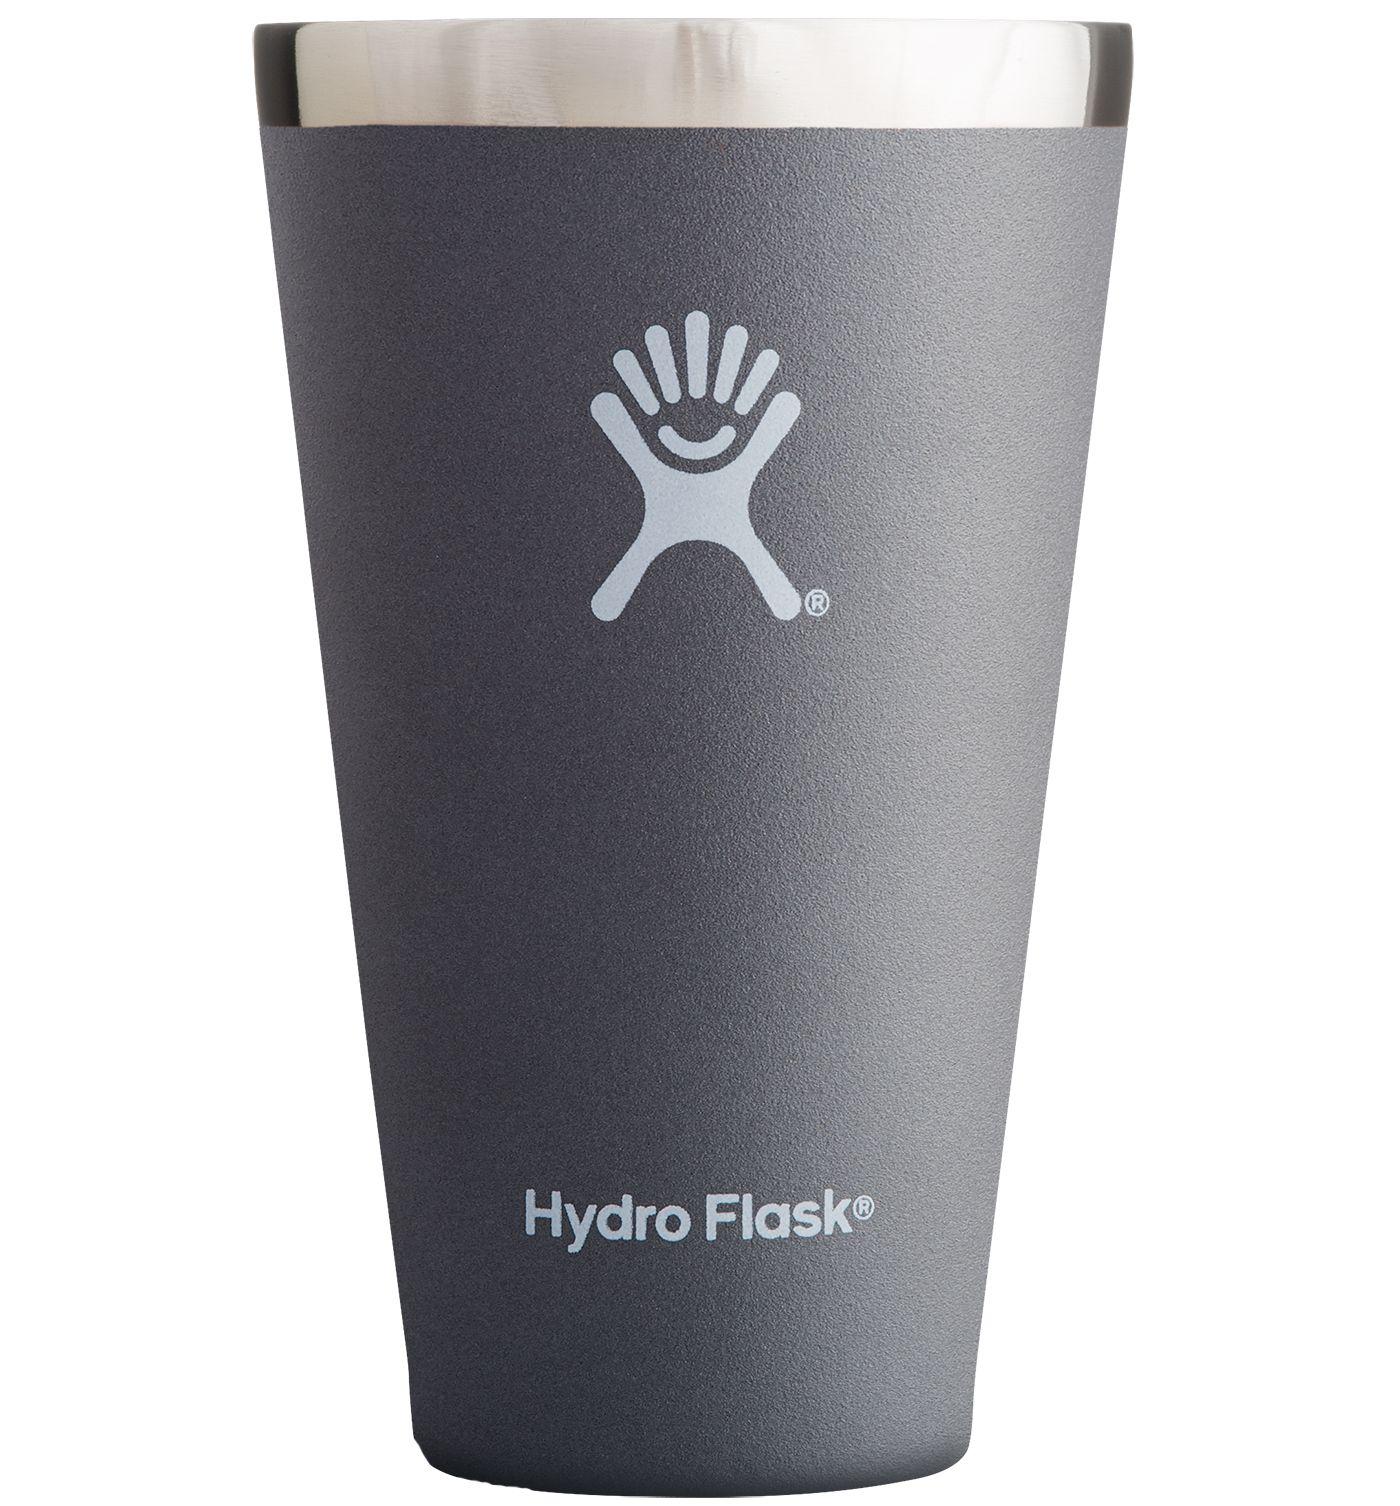 Hydro Flask 16 oz True Pint Cup